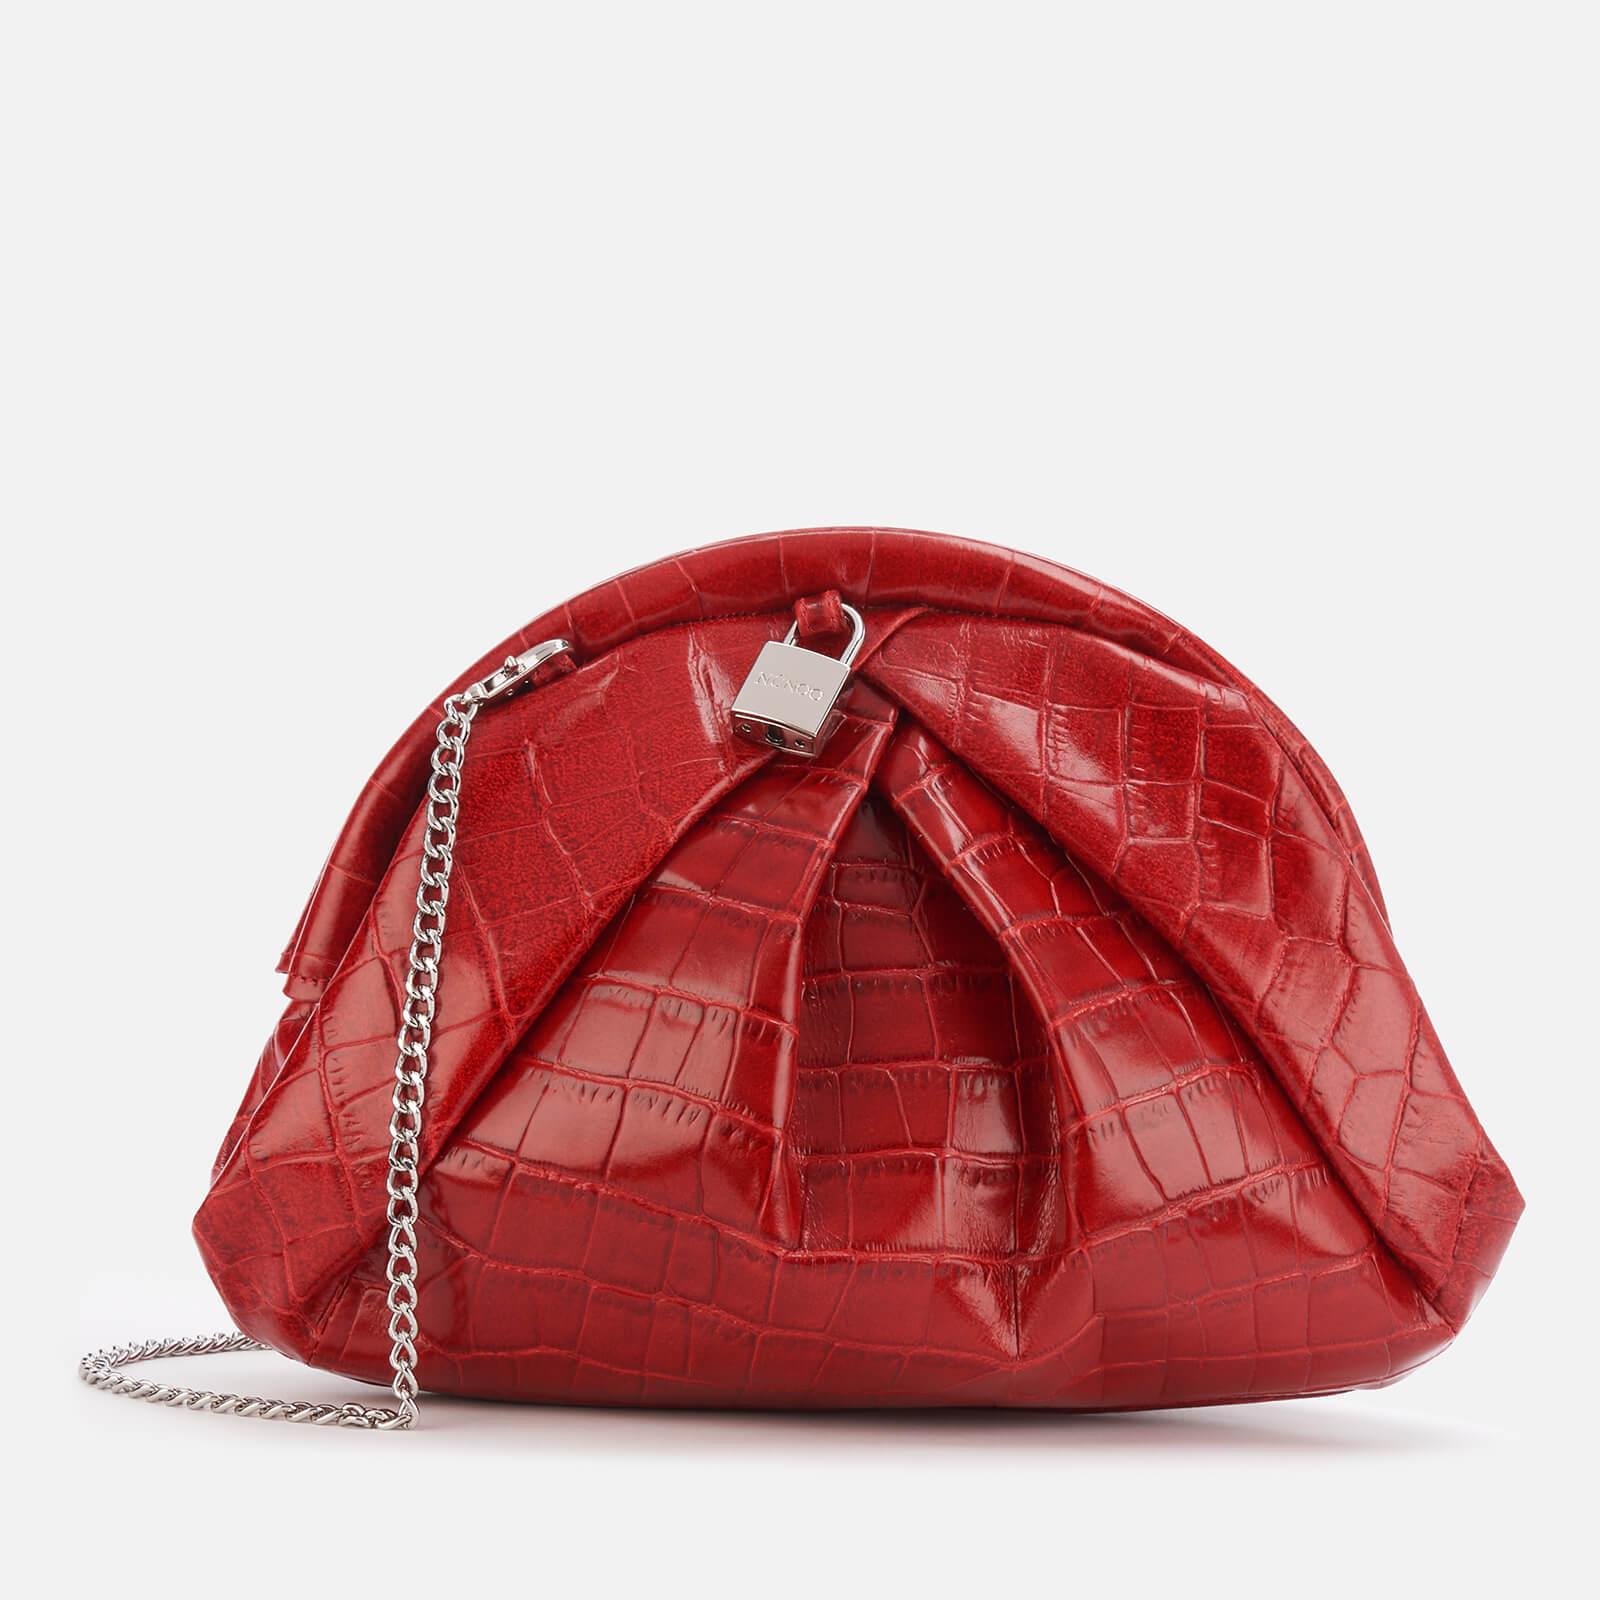 Núnoo Women's Saki Croco Bag - Red